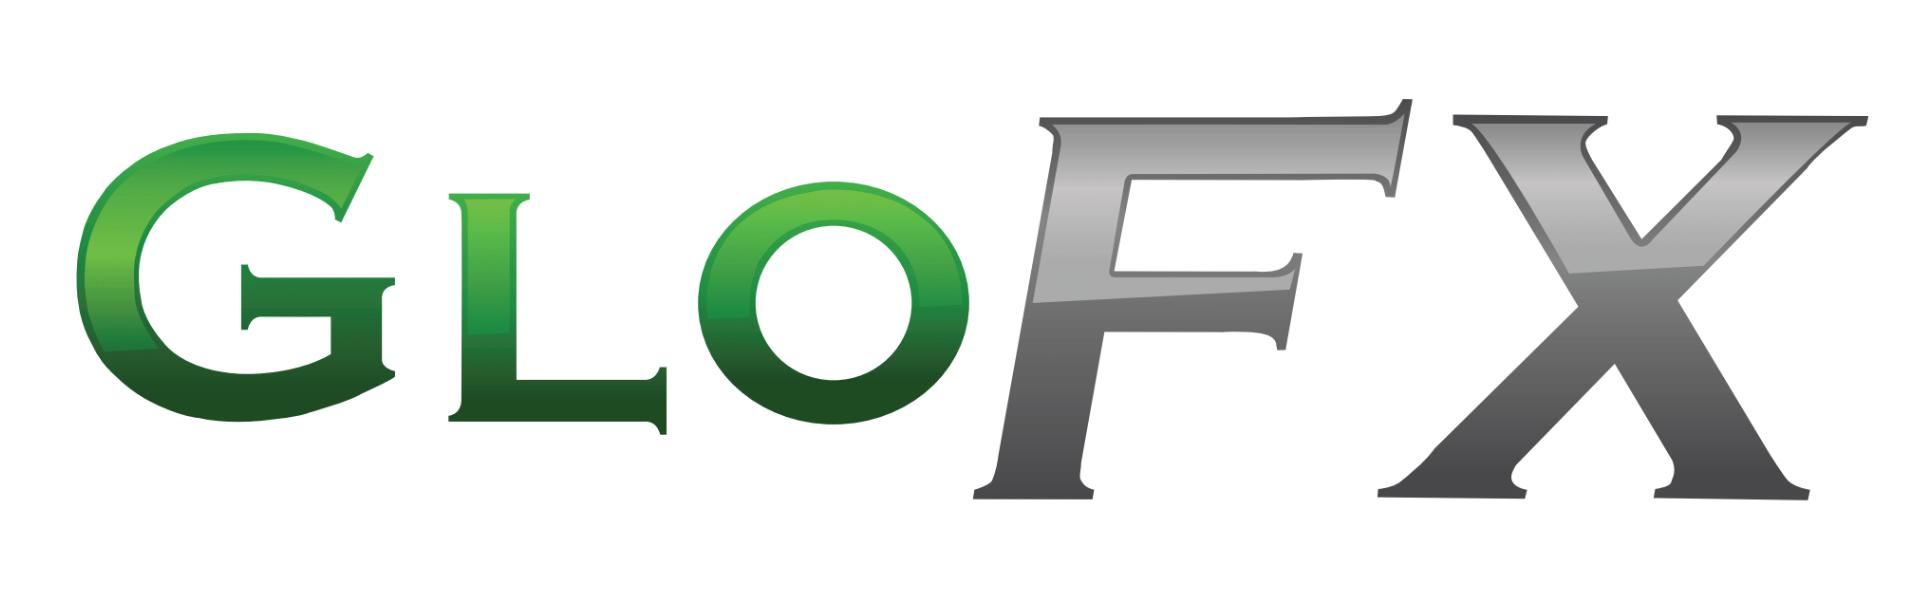 glofx logo.PNG